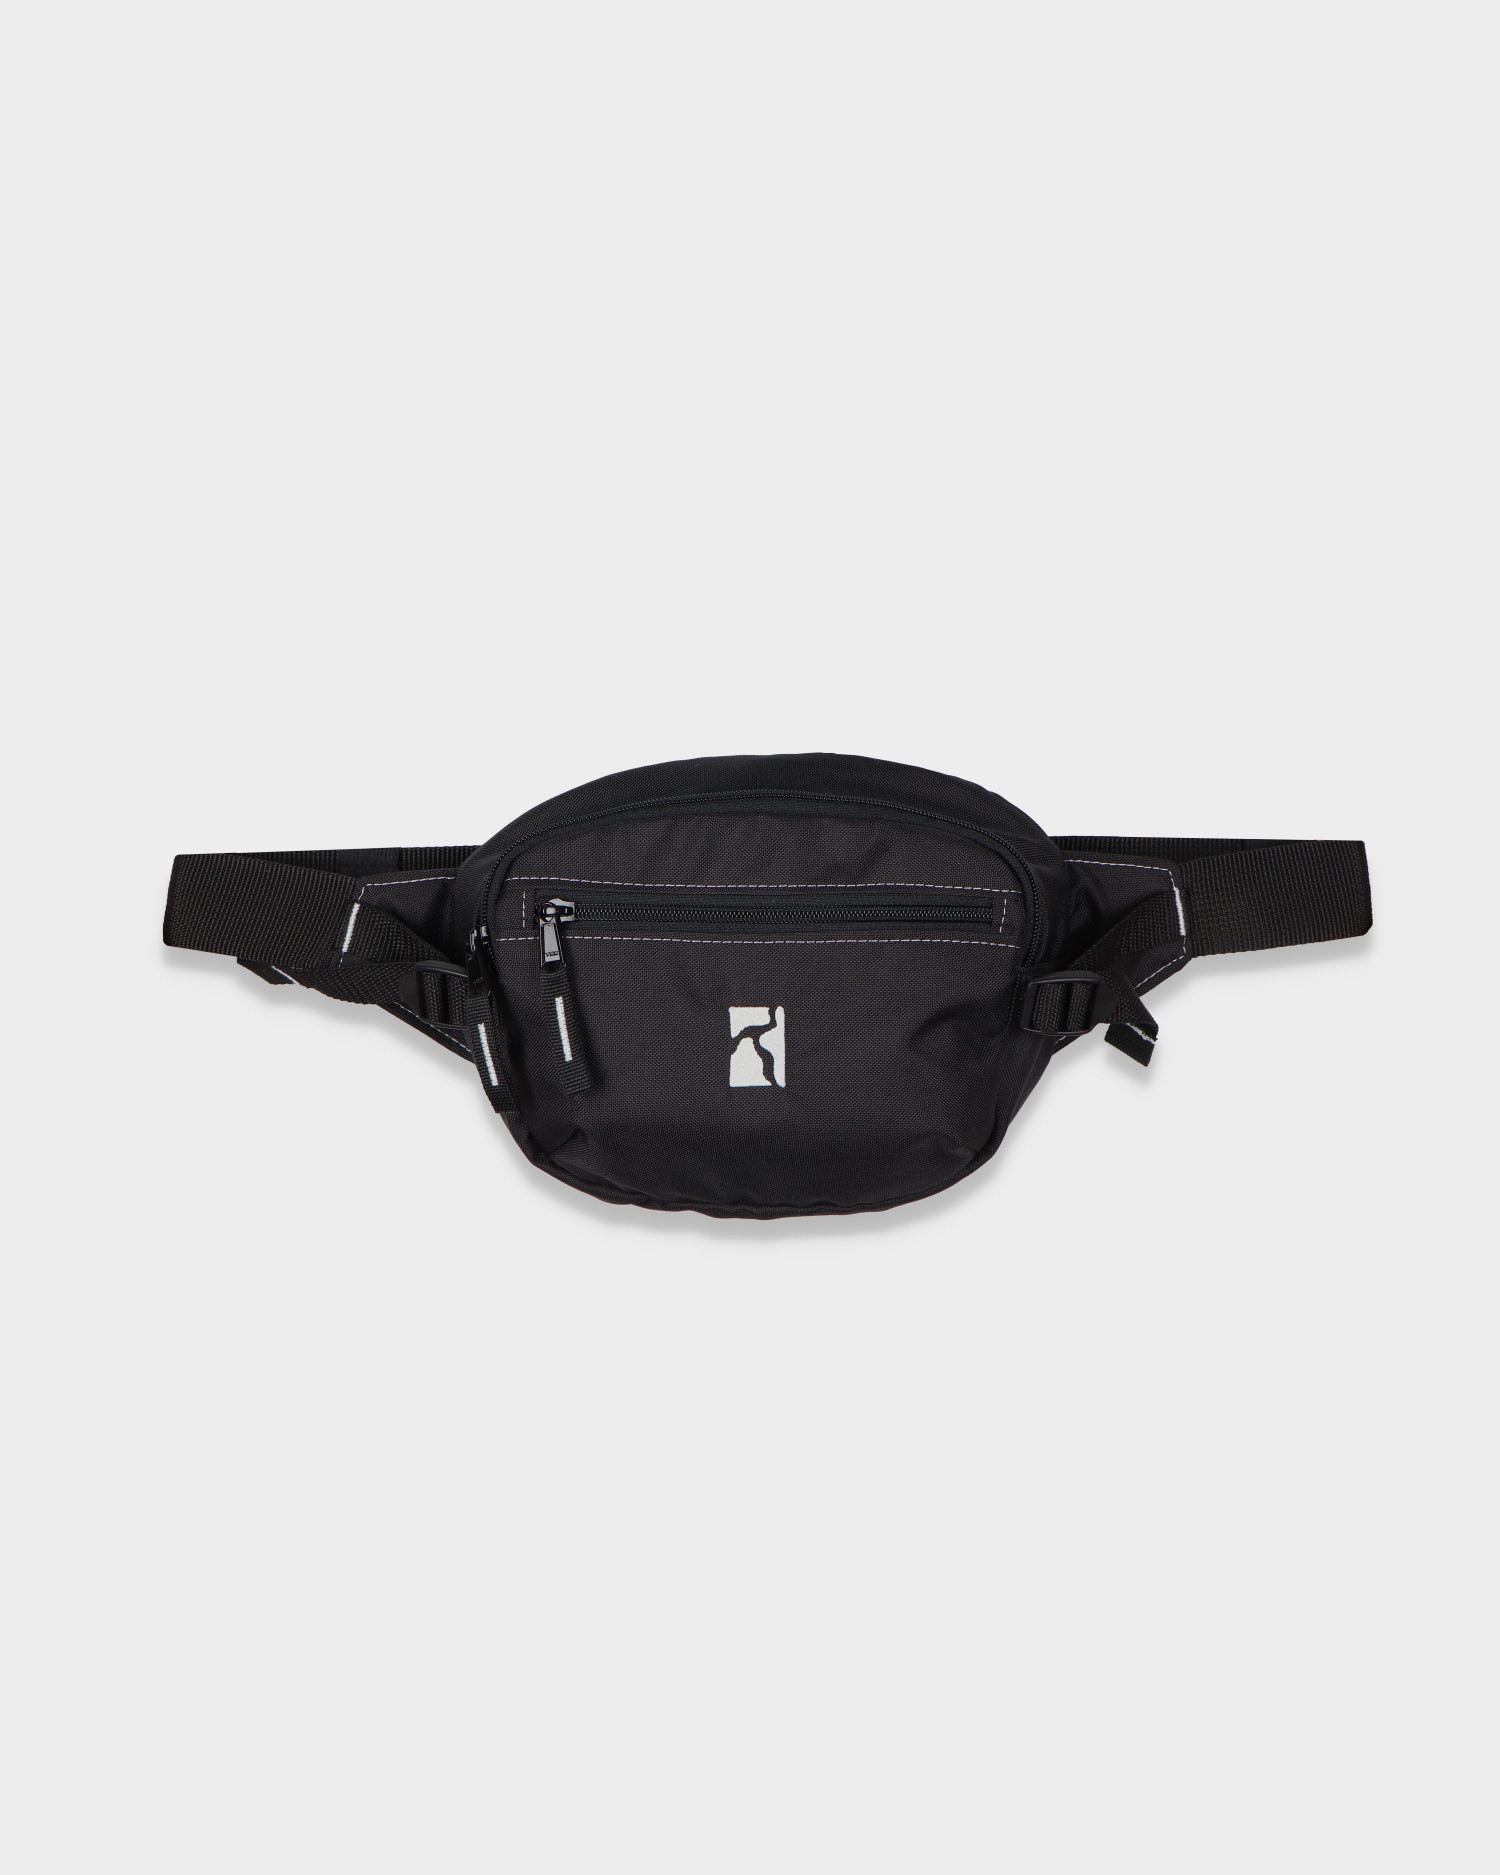 Poetic Collective Premium Belt Bag Black/White Seams